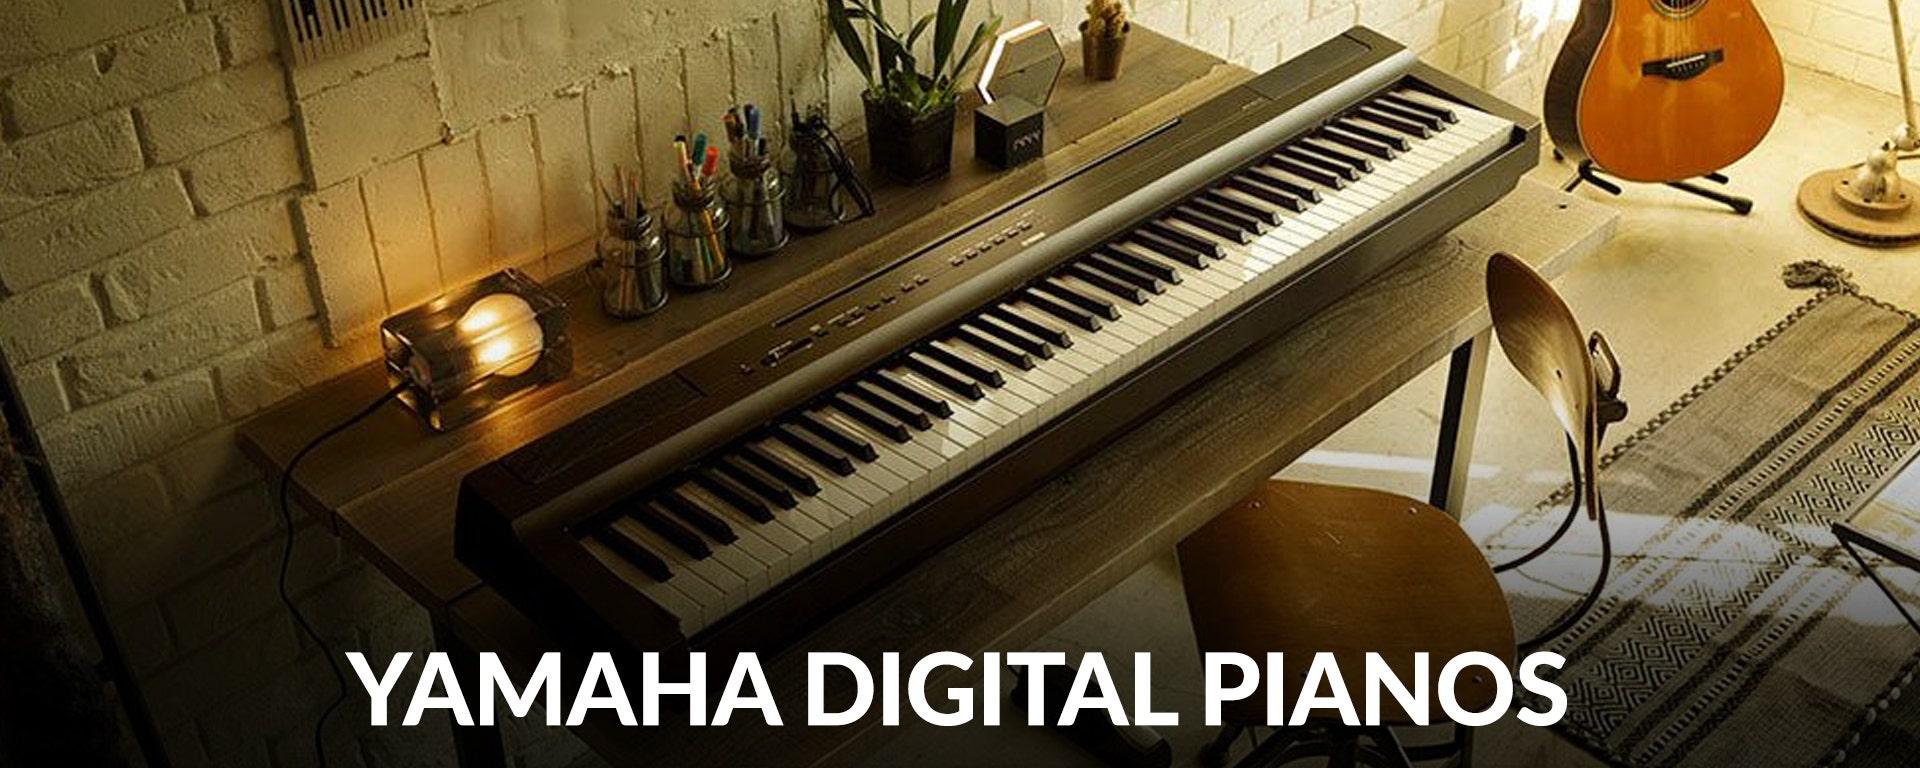 Shop Yamaha Digital Pianos at SamAsh.com